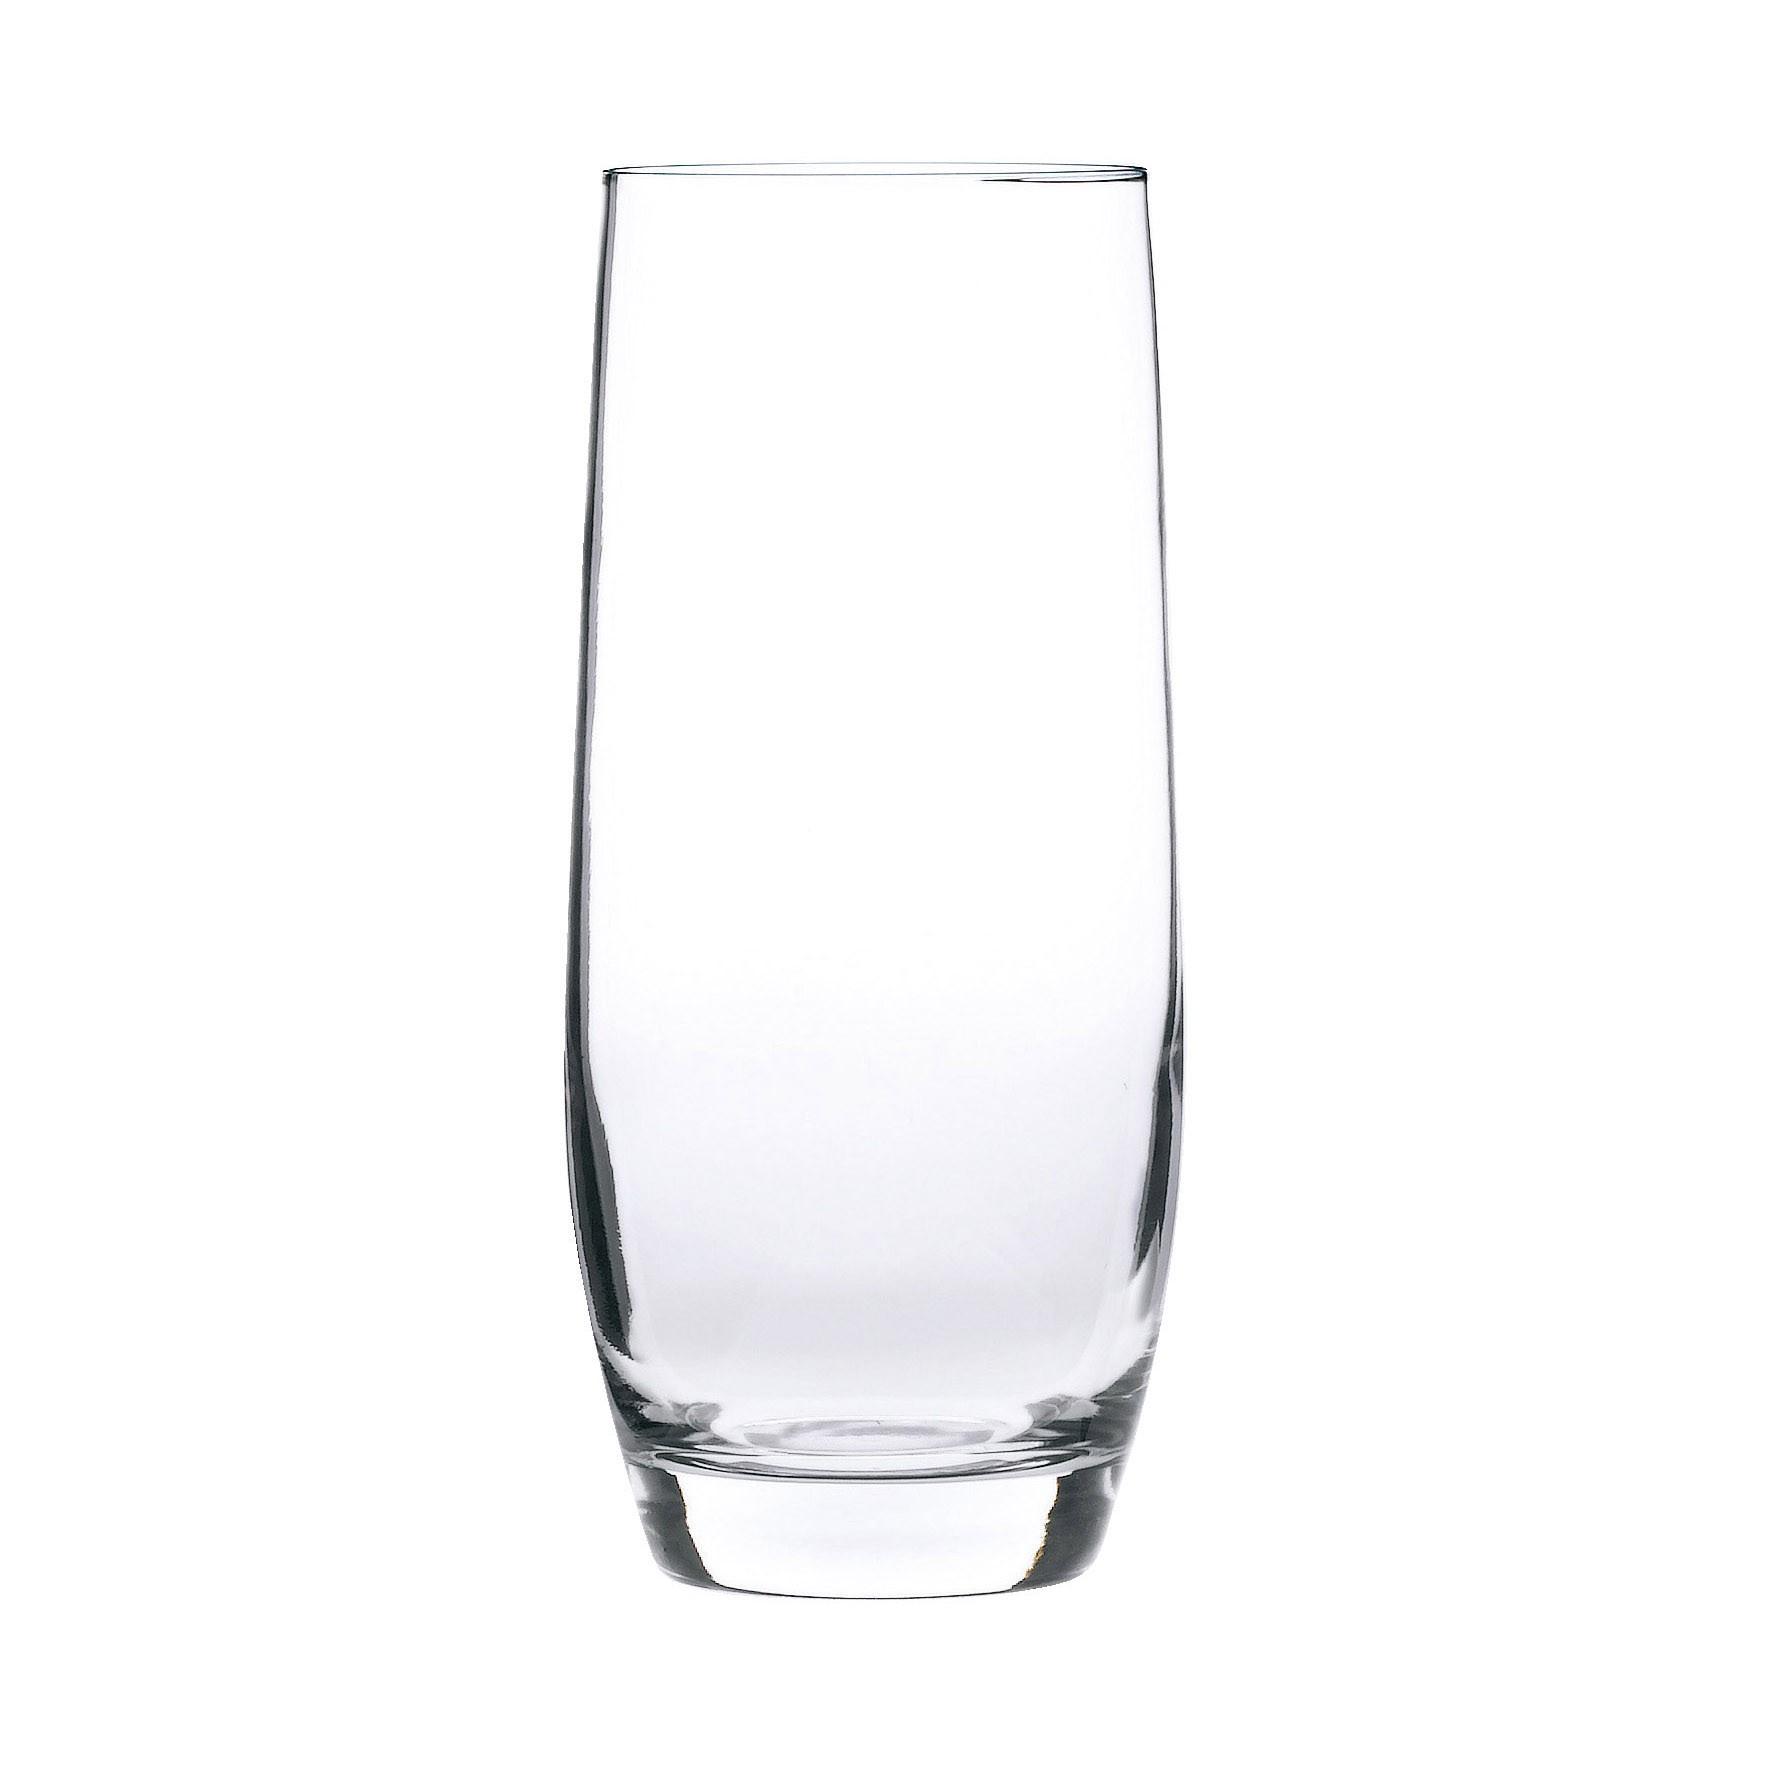 Rubino Beverage Glasses 47cl 16.5oz